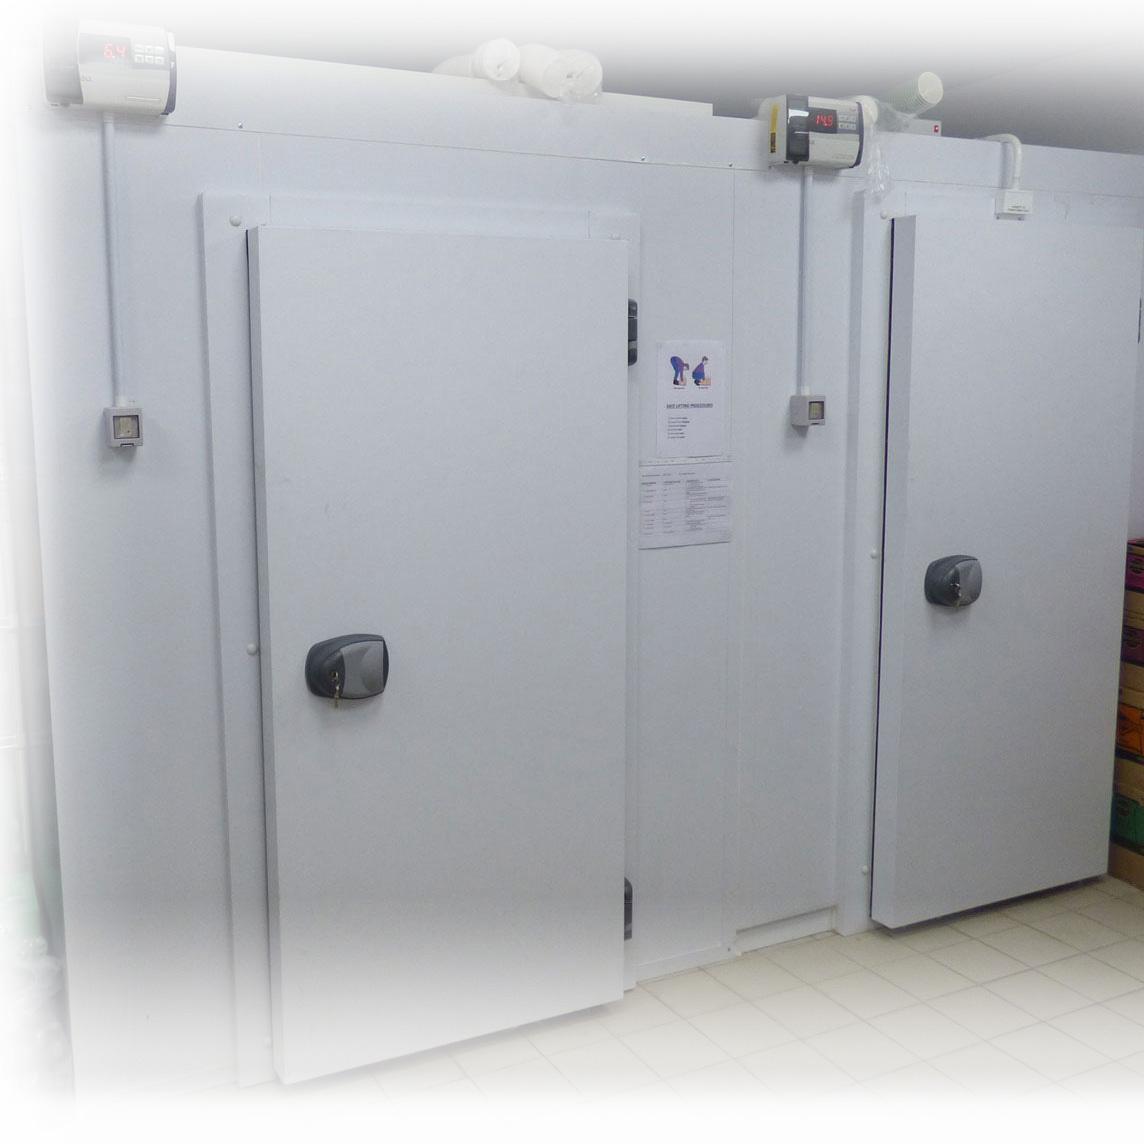 da384d324f Degree Refrigation